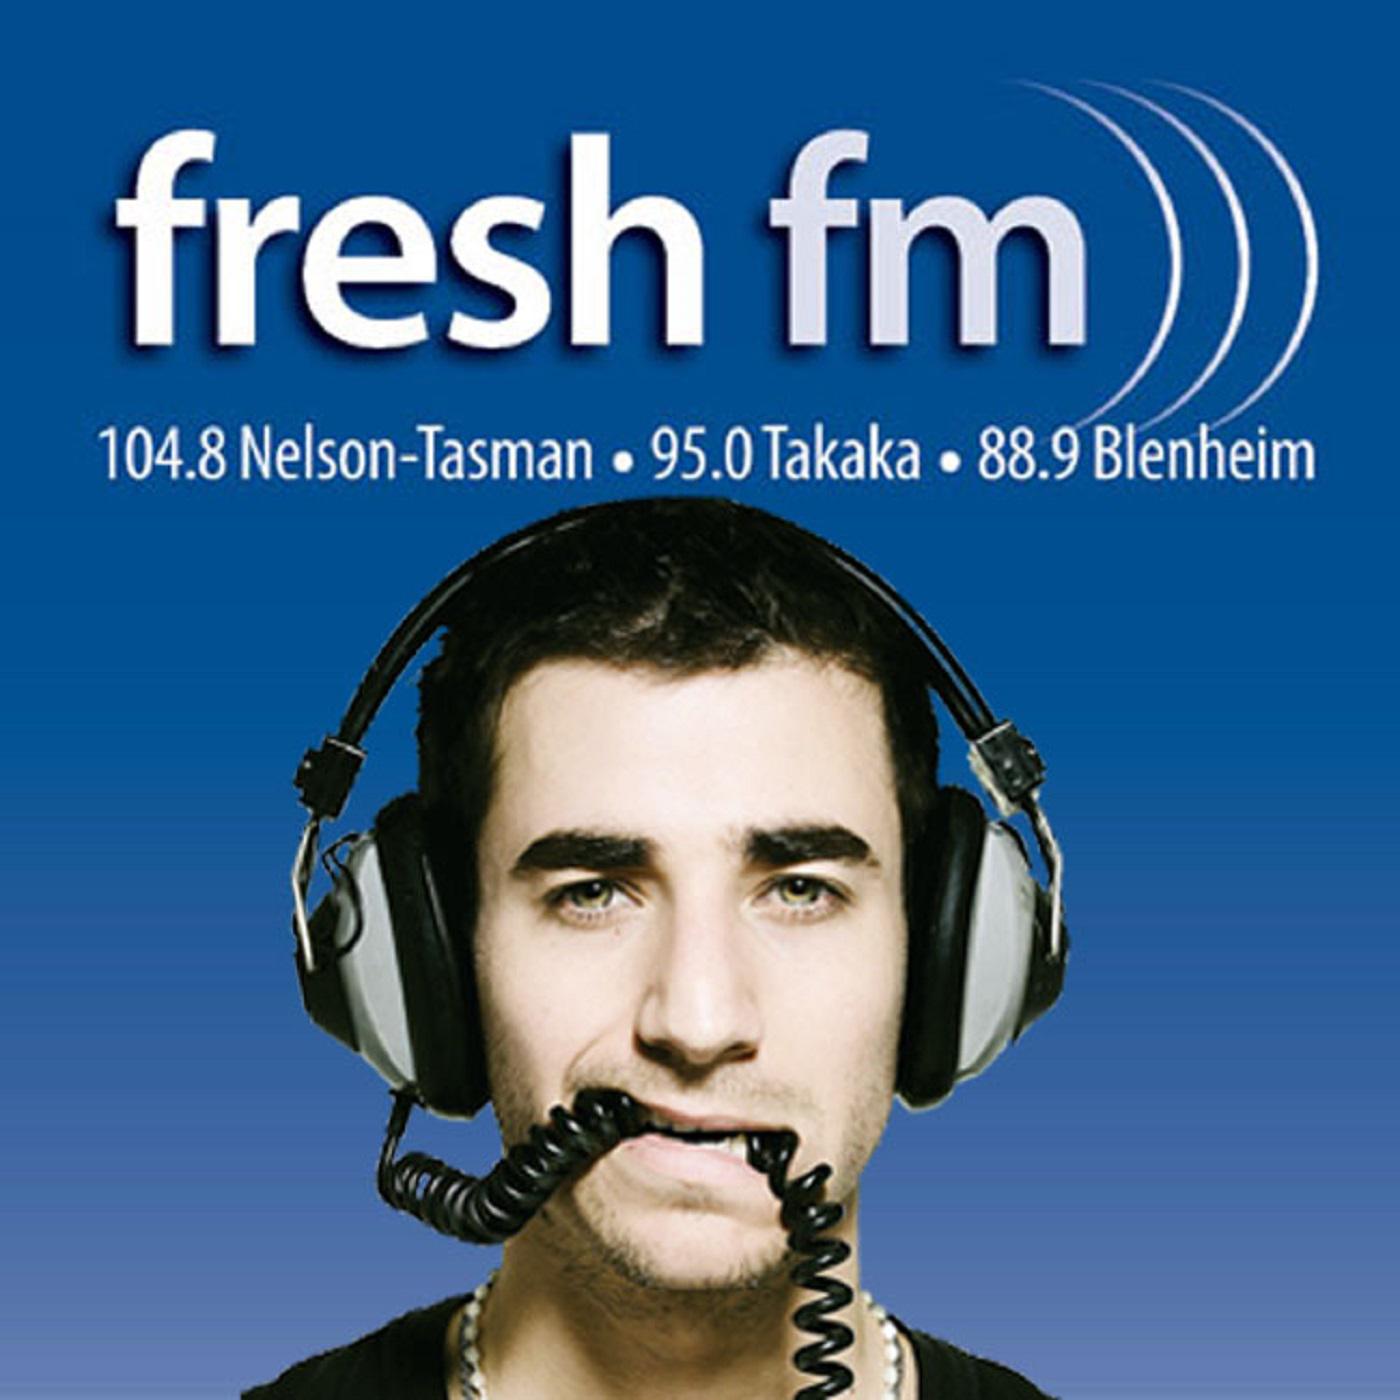 https://cdn.accessradio.org/StationFolder/freshfm/Images/Fresh-FM-Art140011.png